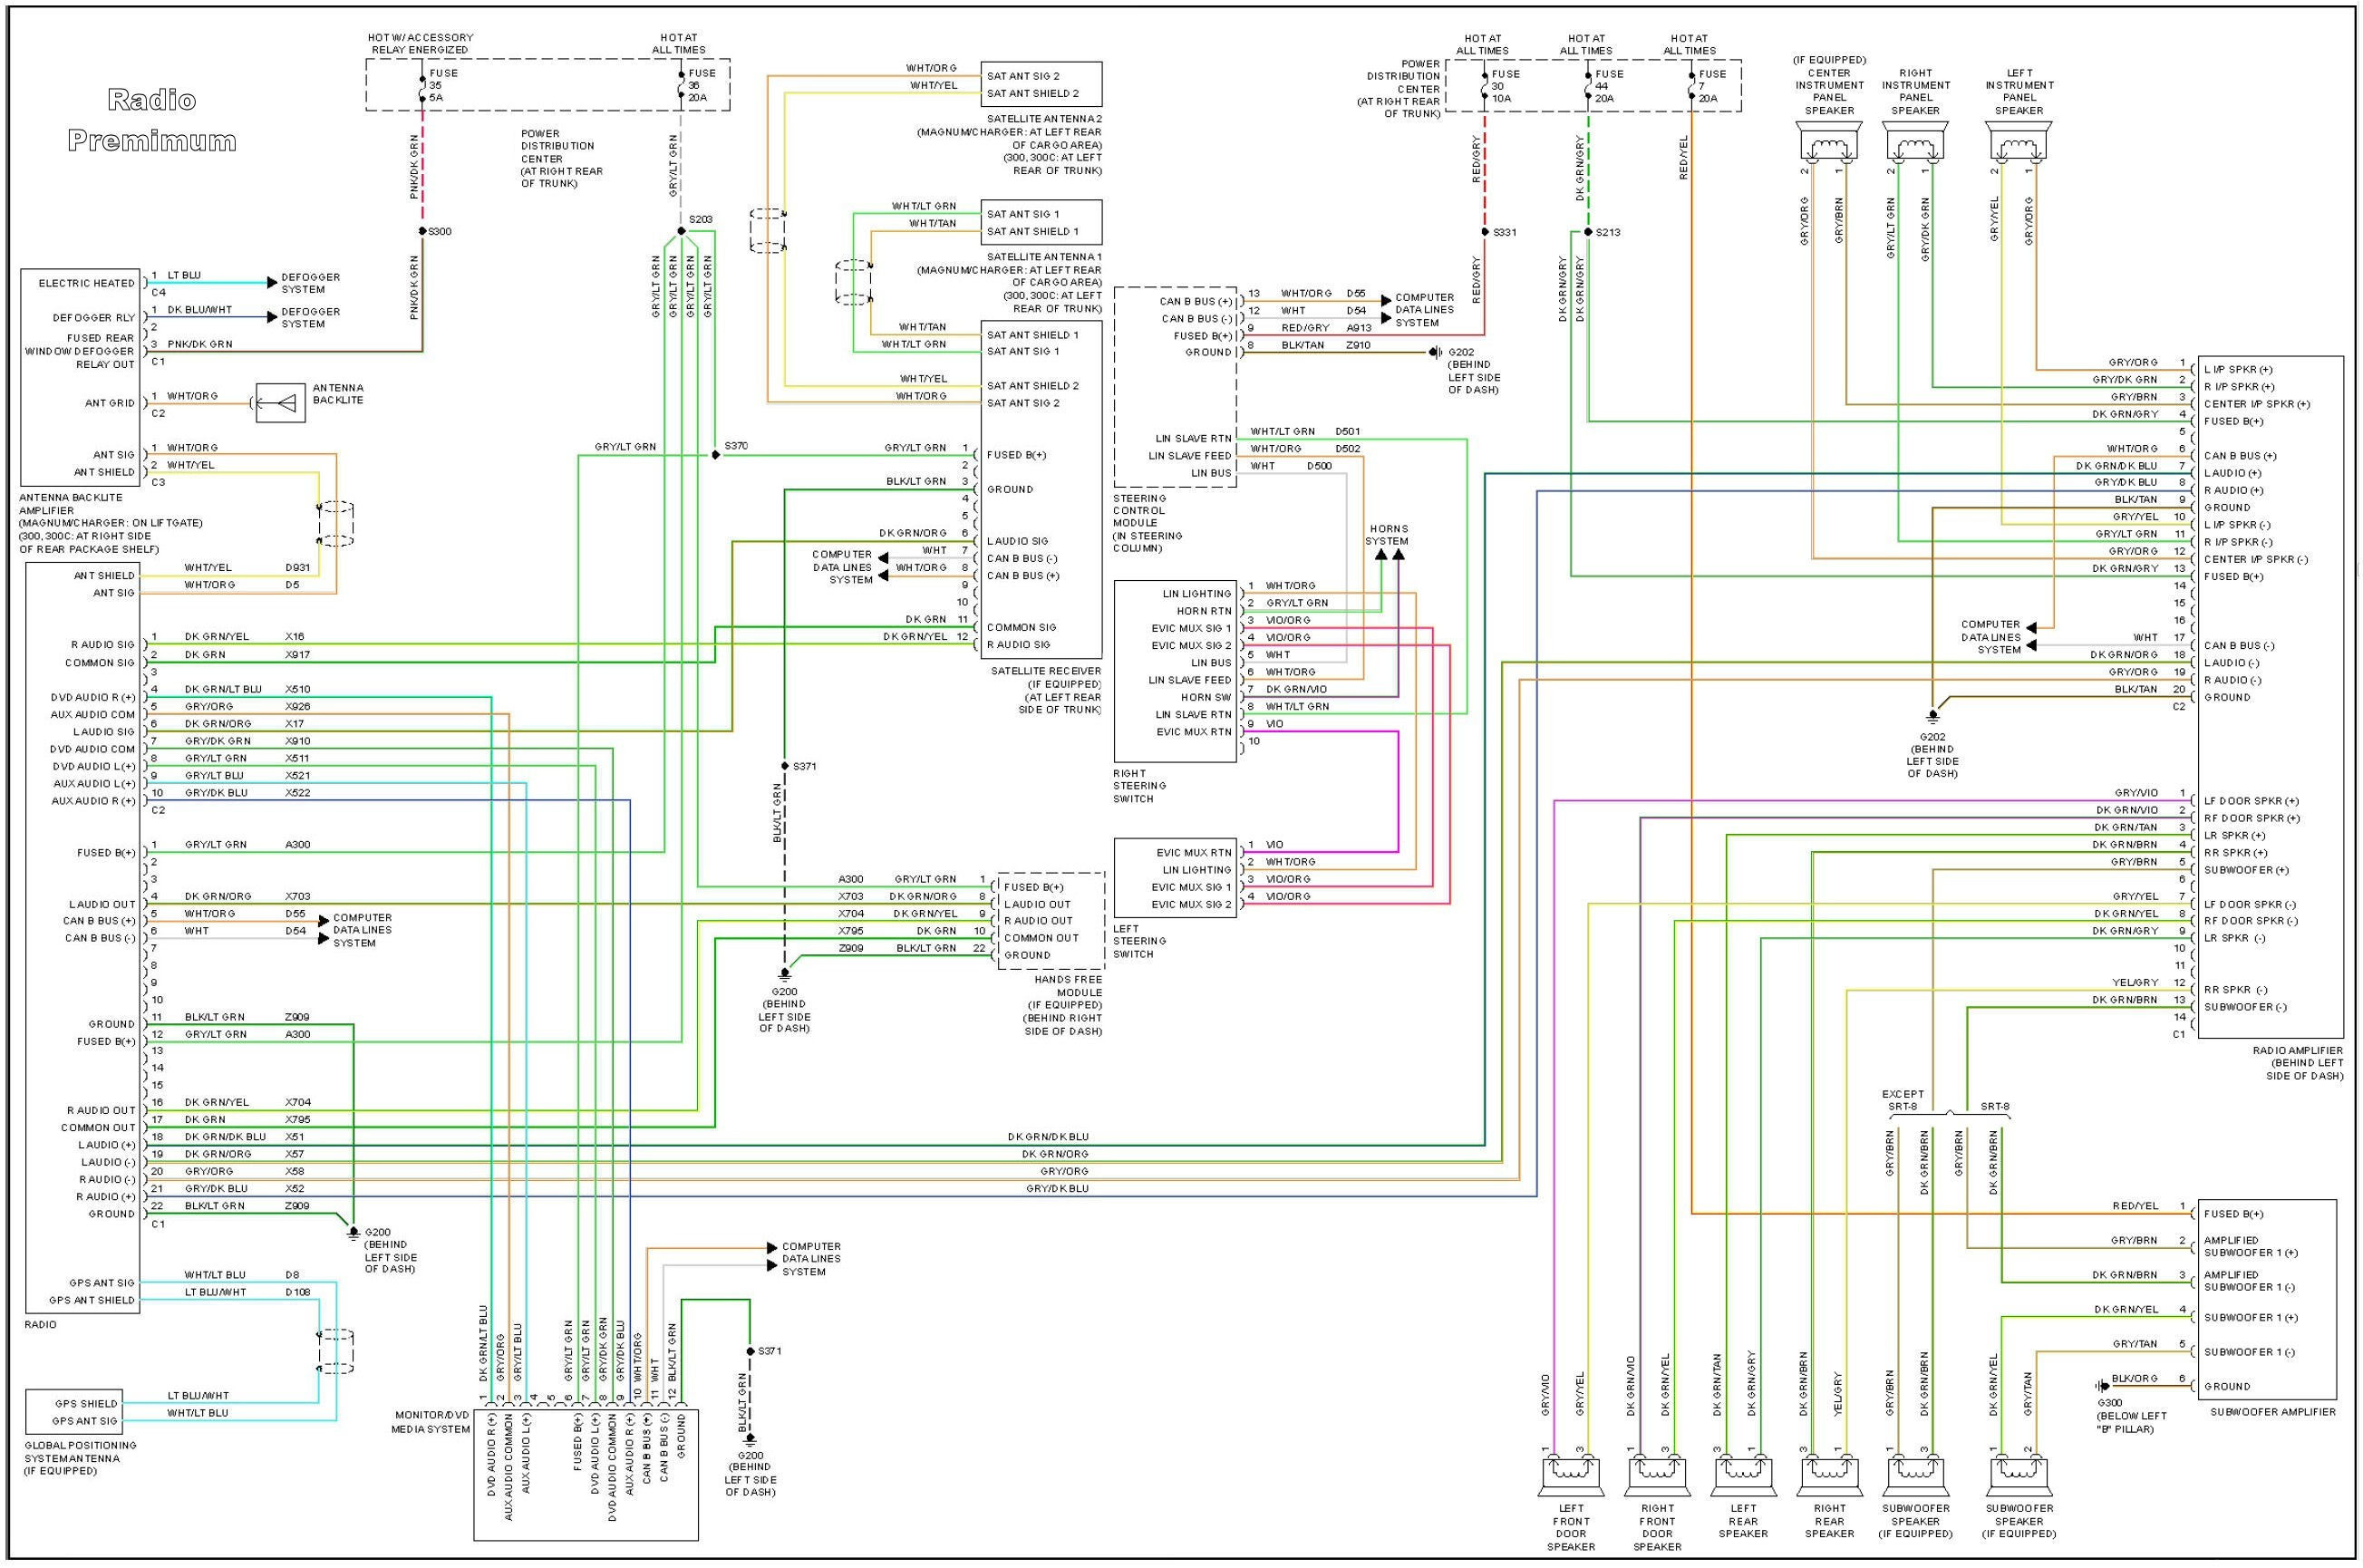 2007 Chrysler Pacifica Radio Wiring Diagram Rate Chrysler Wiring Diagrams Schematics Chrysler Wiring Diagrams